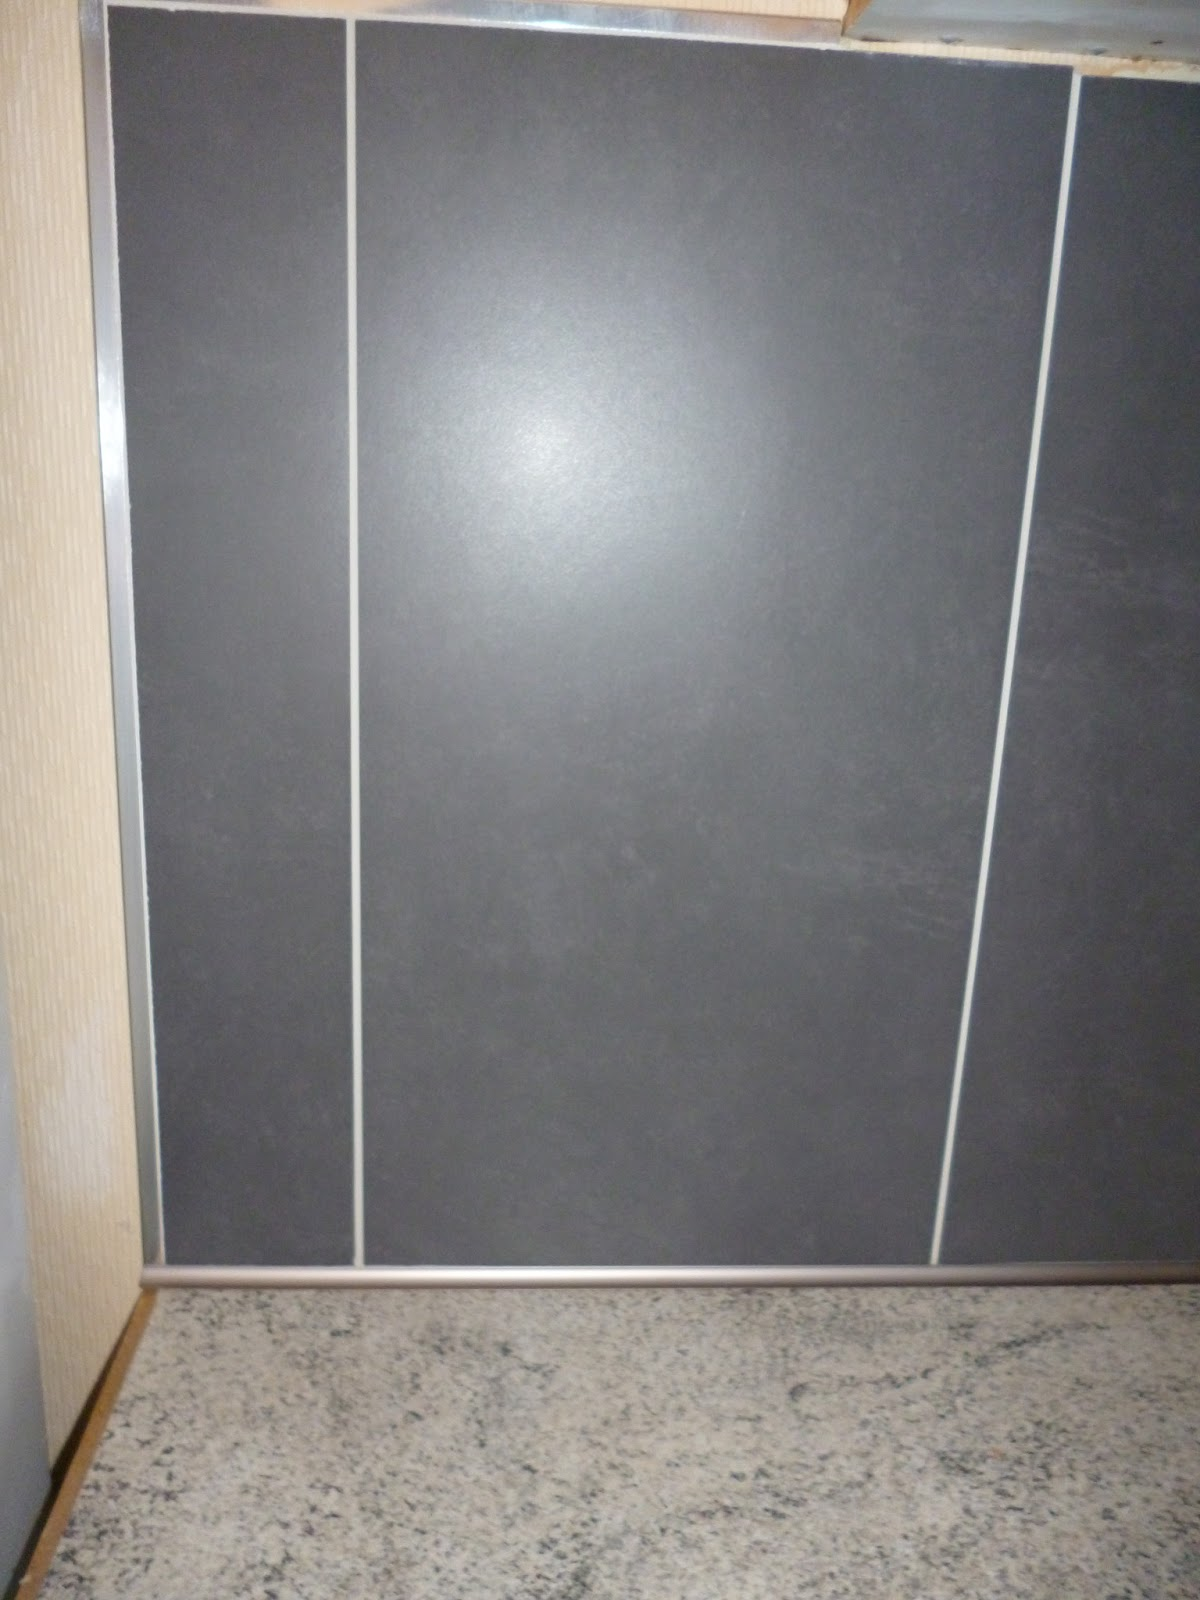 credence de cuisine 30x60 anthracite avec t cove titane julienbugnetcarrelage. Black Bedroom Furniture Sets. Home Design Ideas